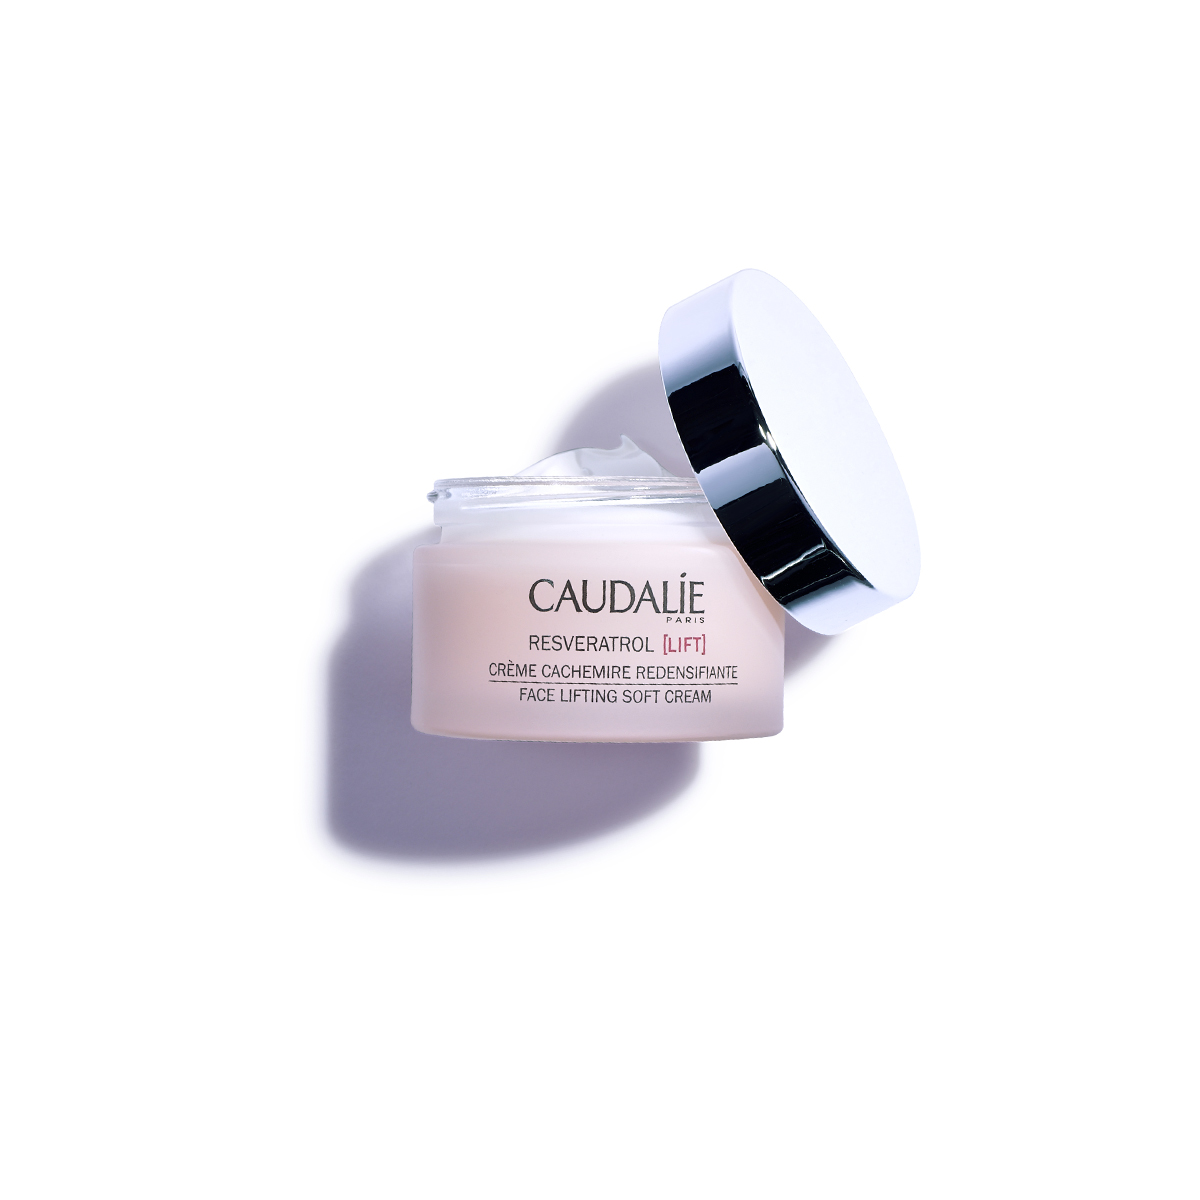 Resveratrol[Lift] Crema Cachemir Redensificante